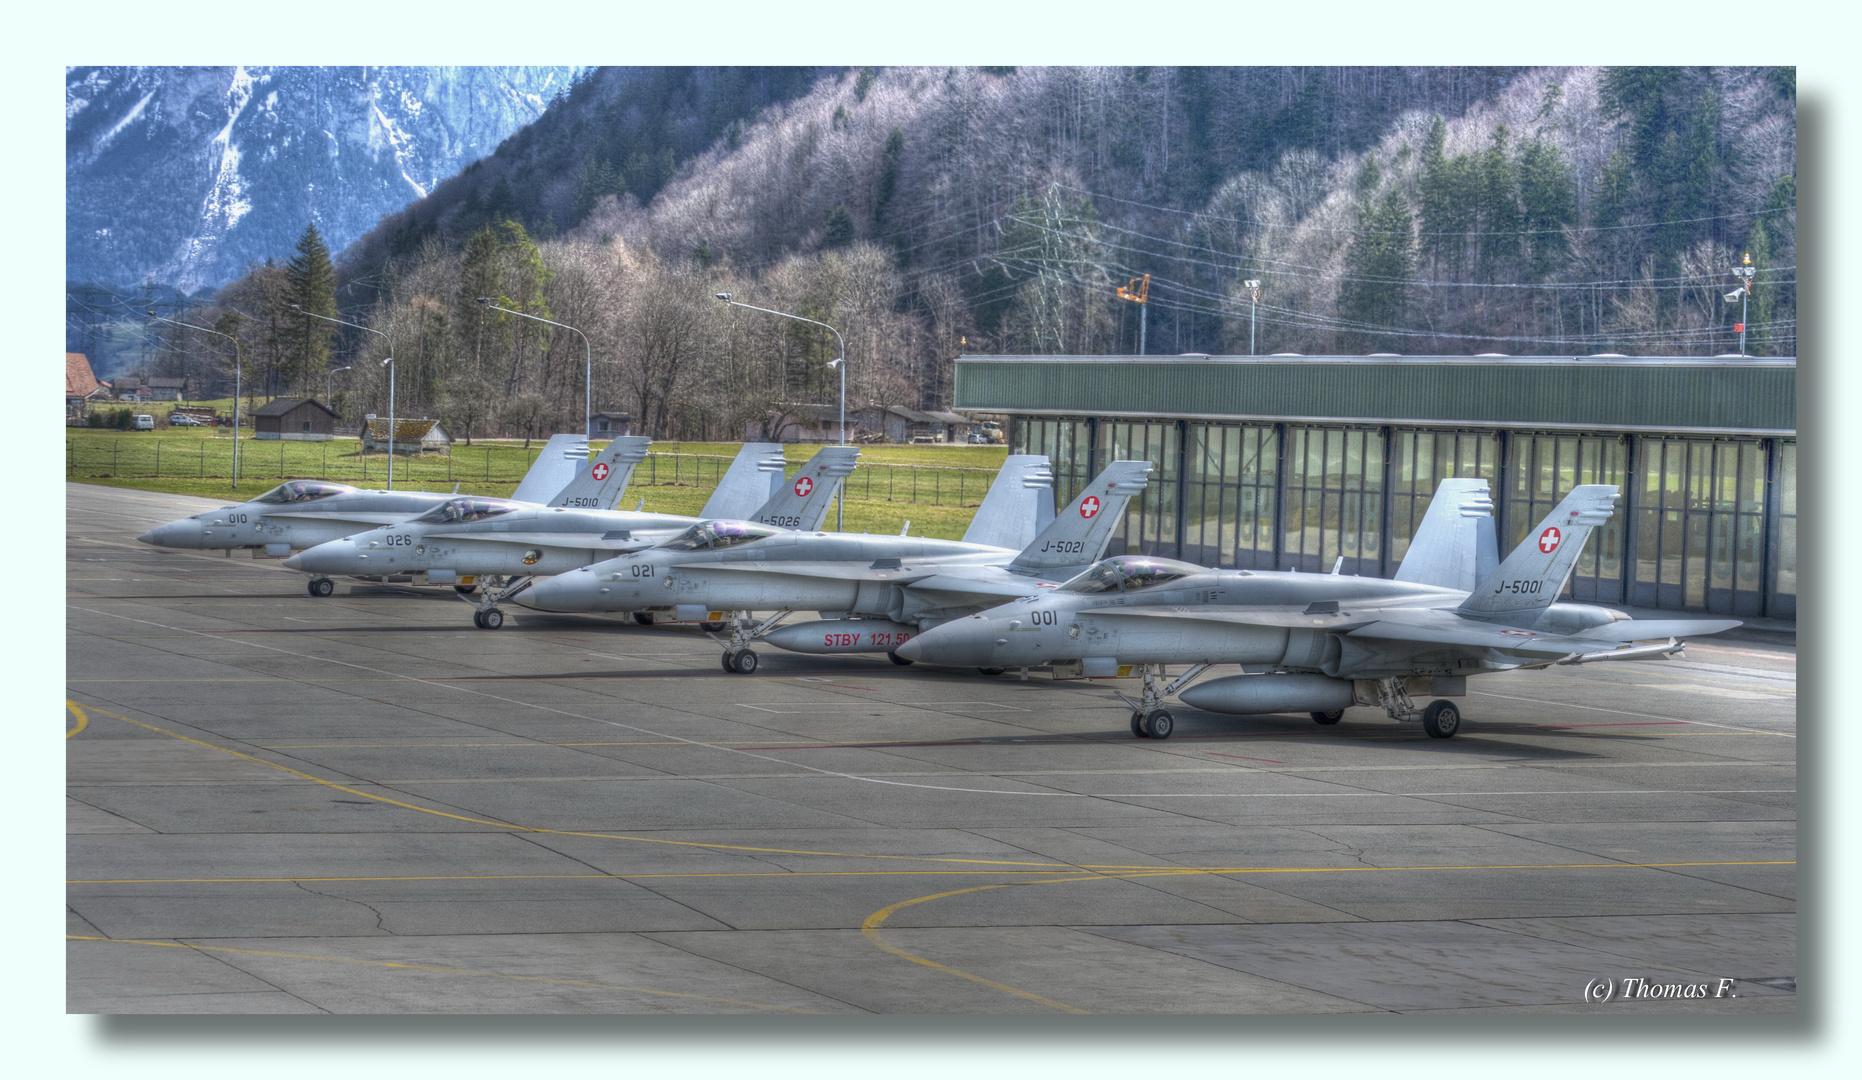 Swiss Air Force Meiringen (Schweiz) 4 F18 bei der letzten Überprüfung